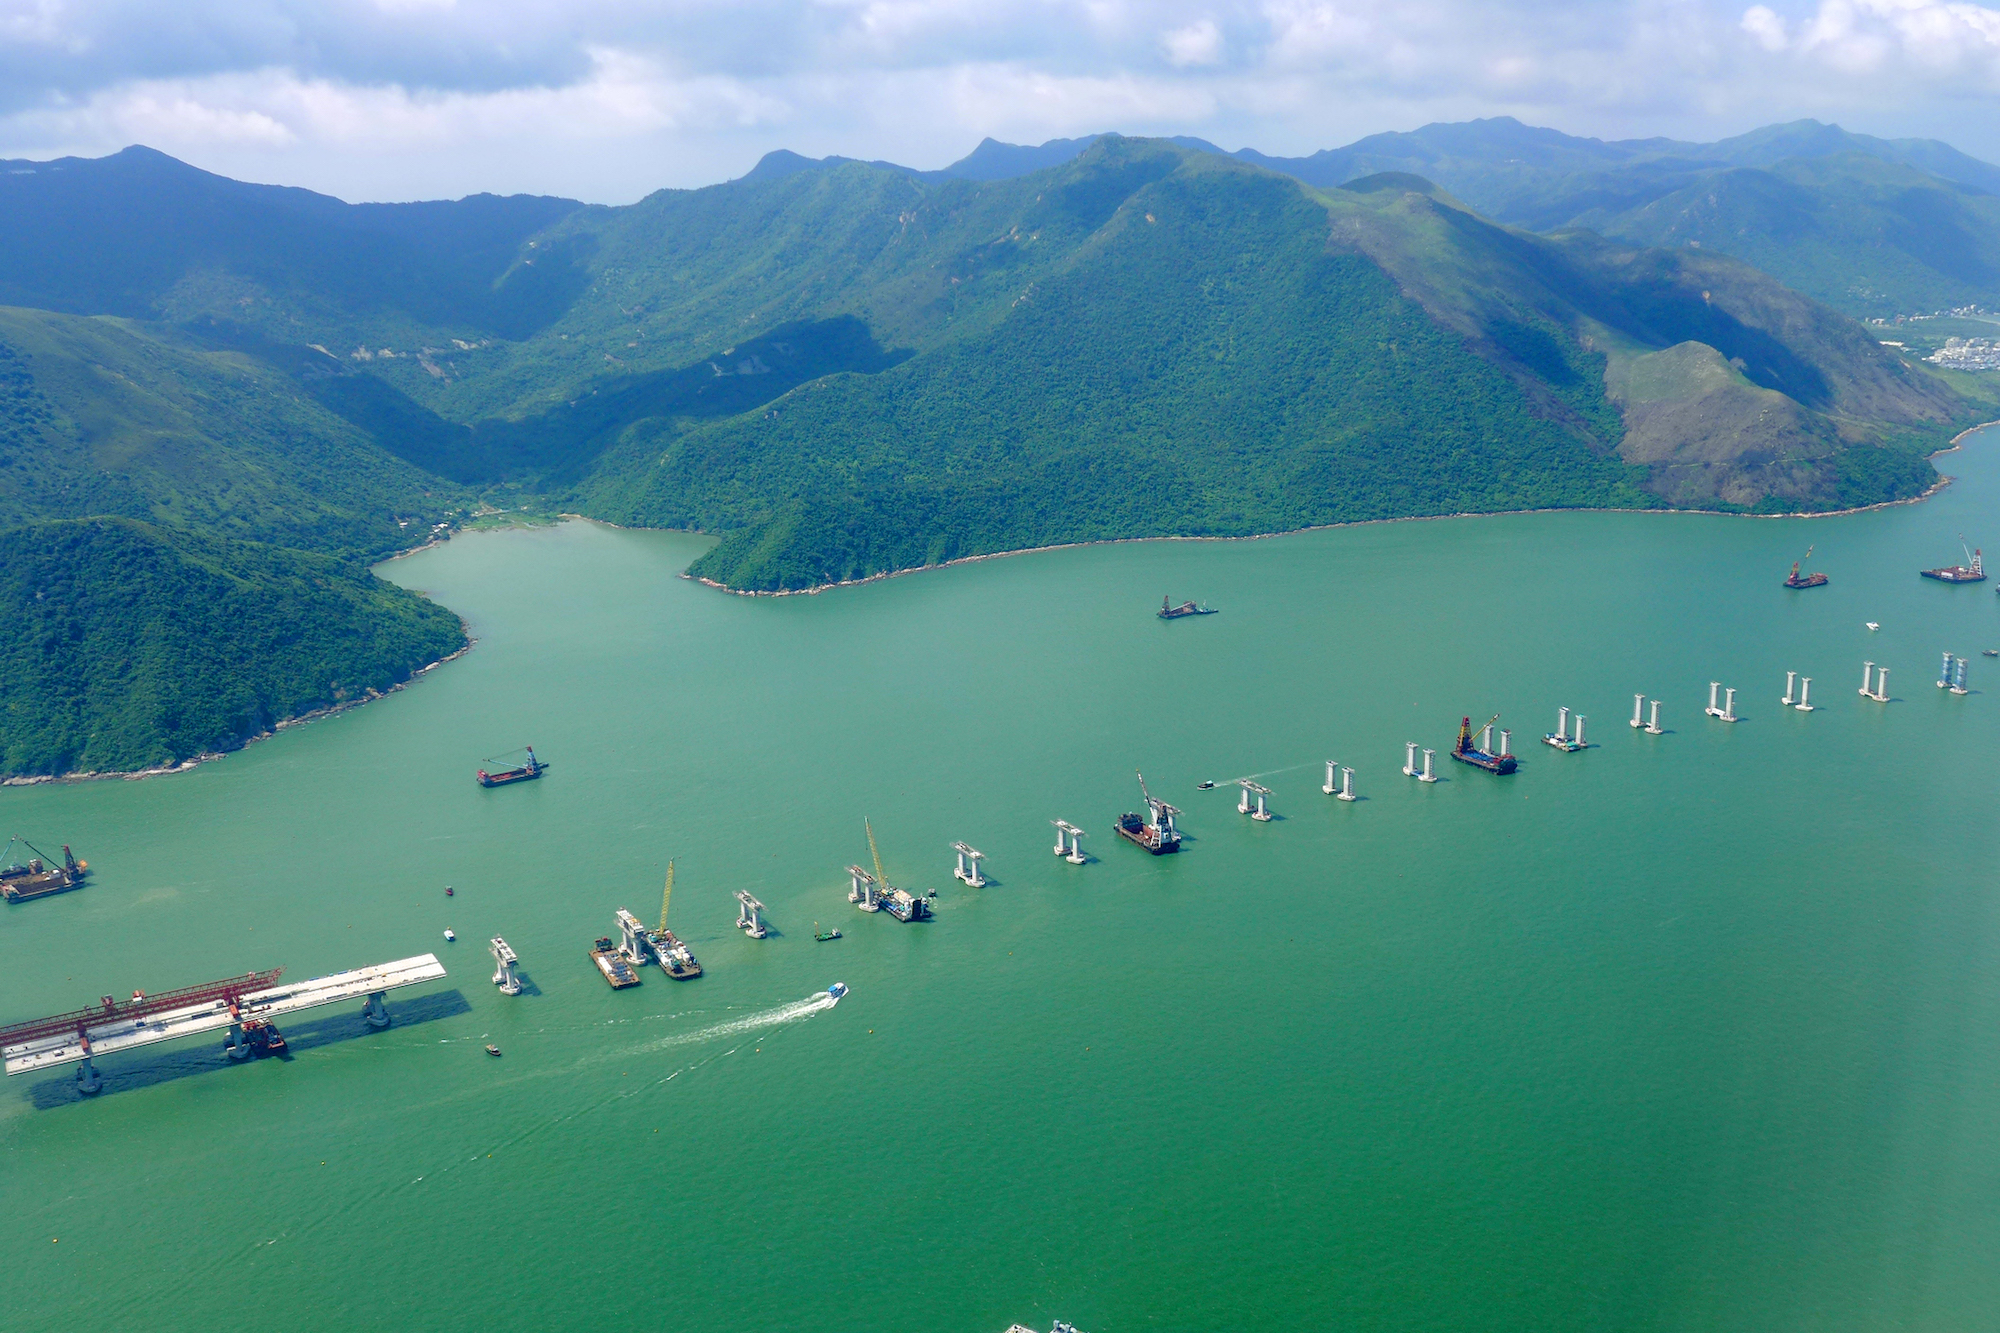 Chine - Pont Hong Kong-Zhuhai-Macao